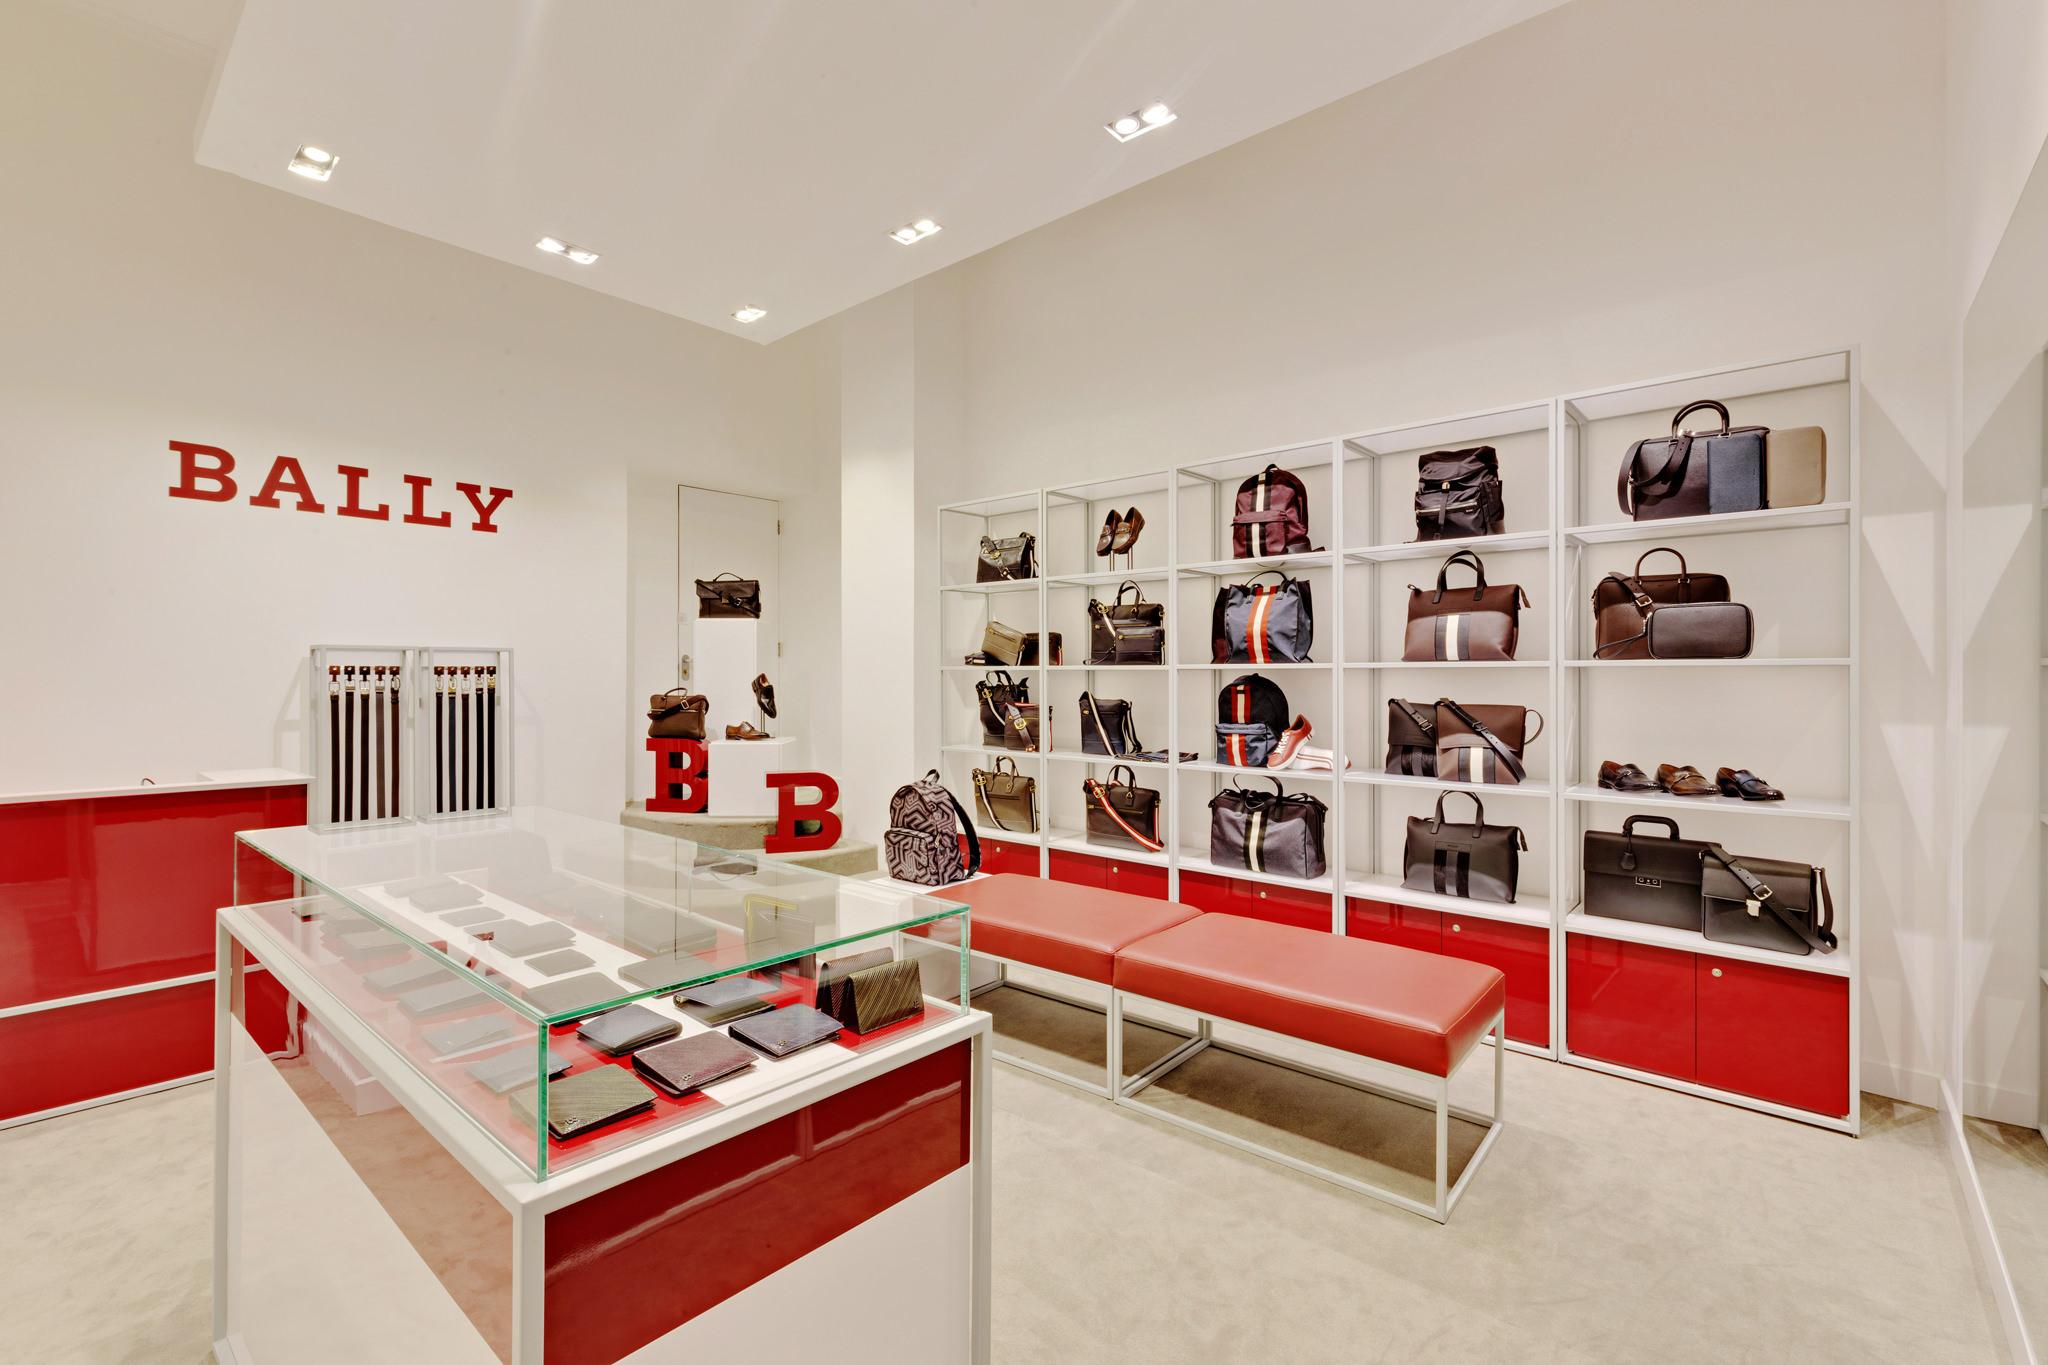 20170316 - Bally - HCM - Commercial - Interior - Store - Retouch 0005.jpg